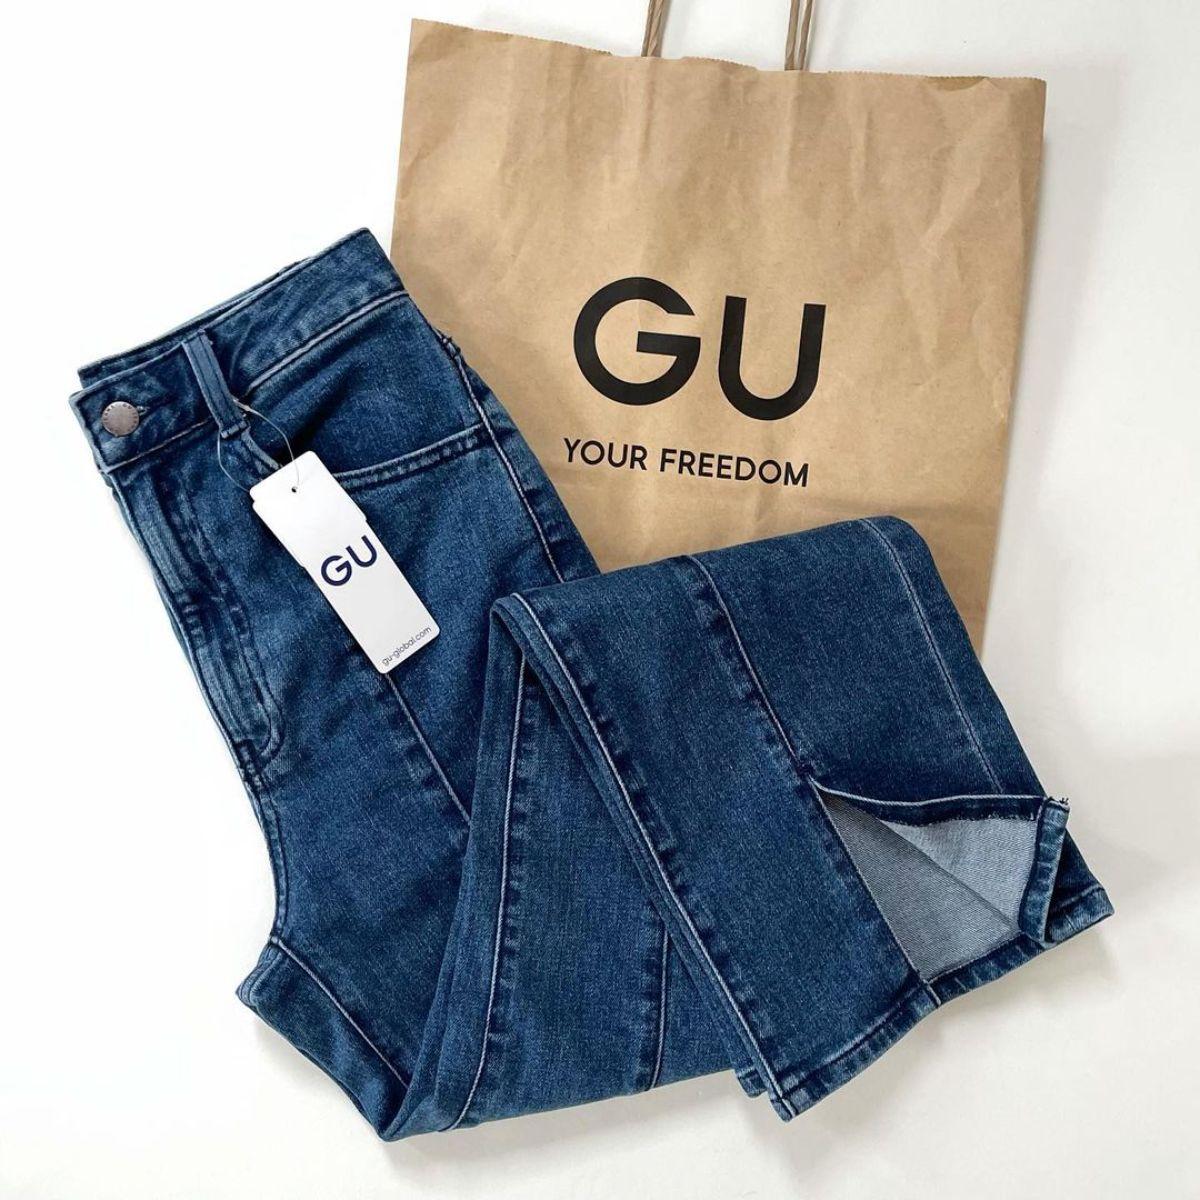 【GU】発売したばかりなのにもう大人気と話題に。「フロントスリットフレアジーンズ」は早めにチェックして